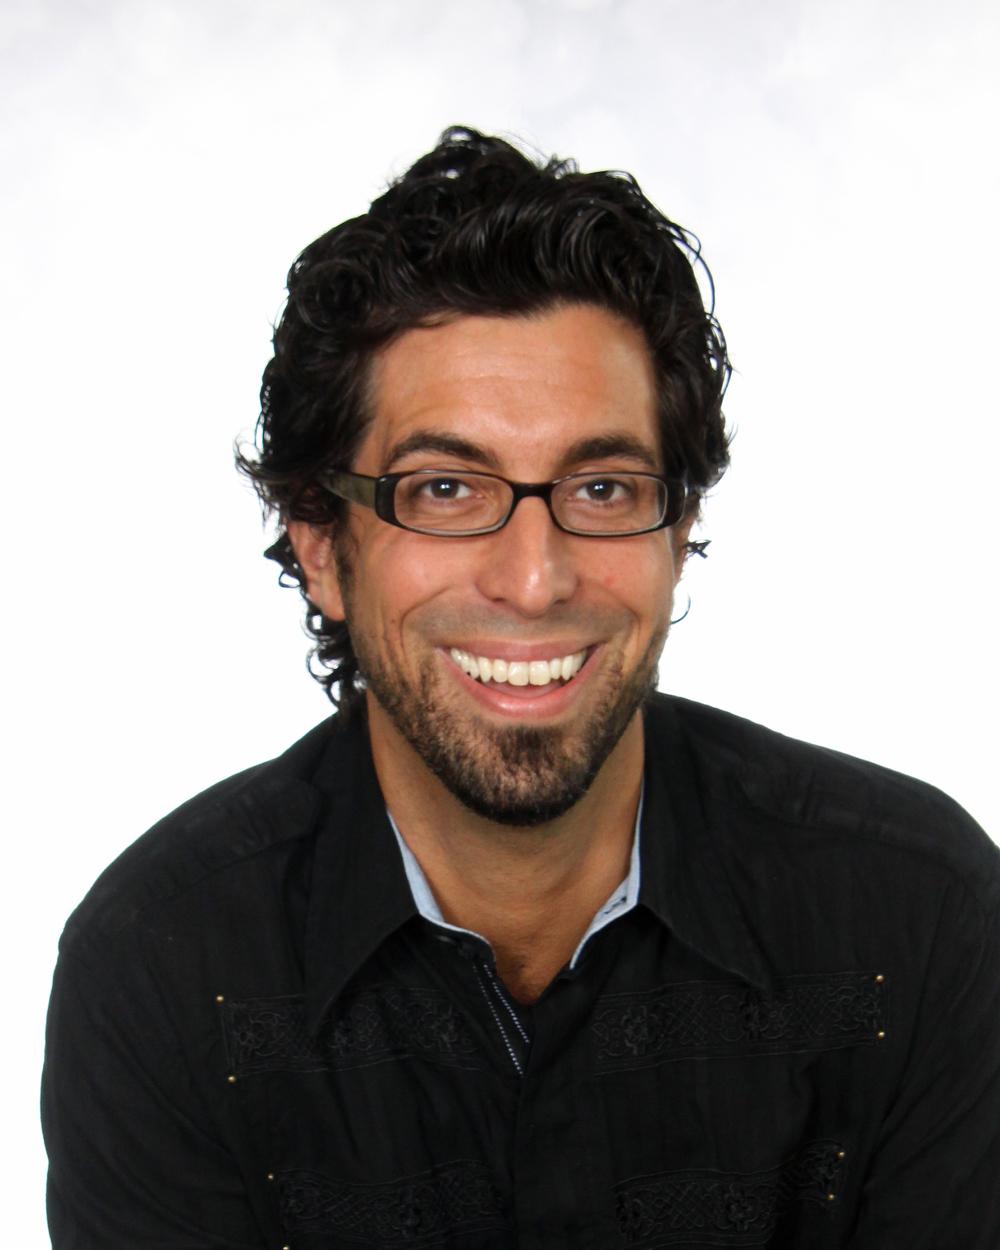 Michael Pavlick